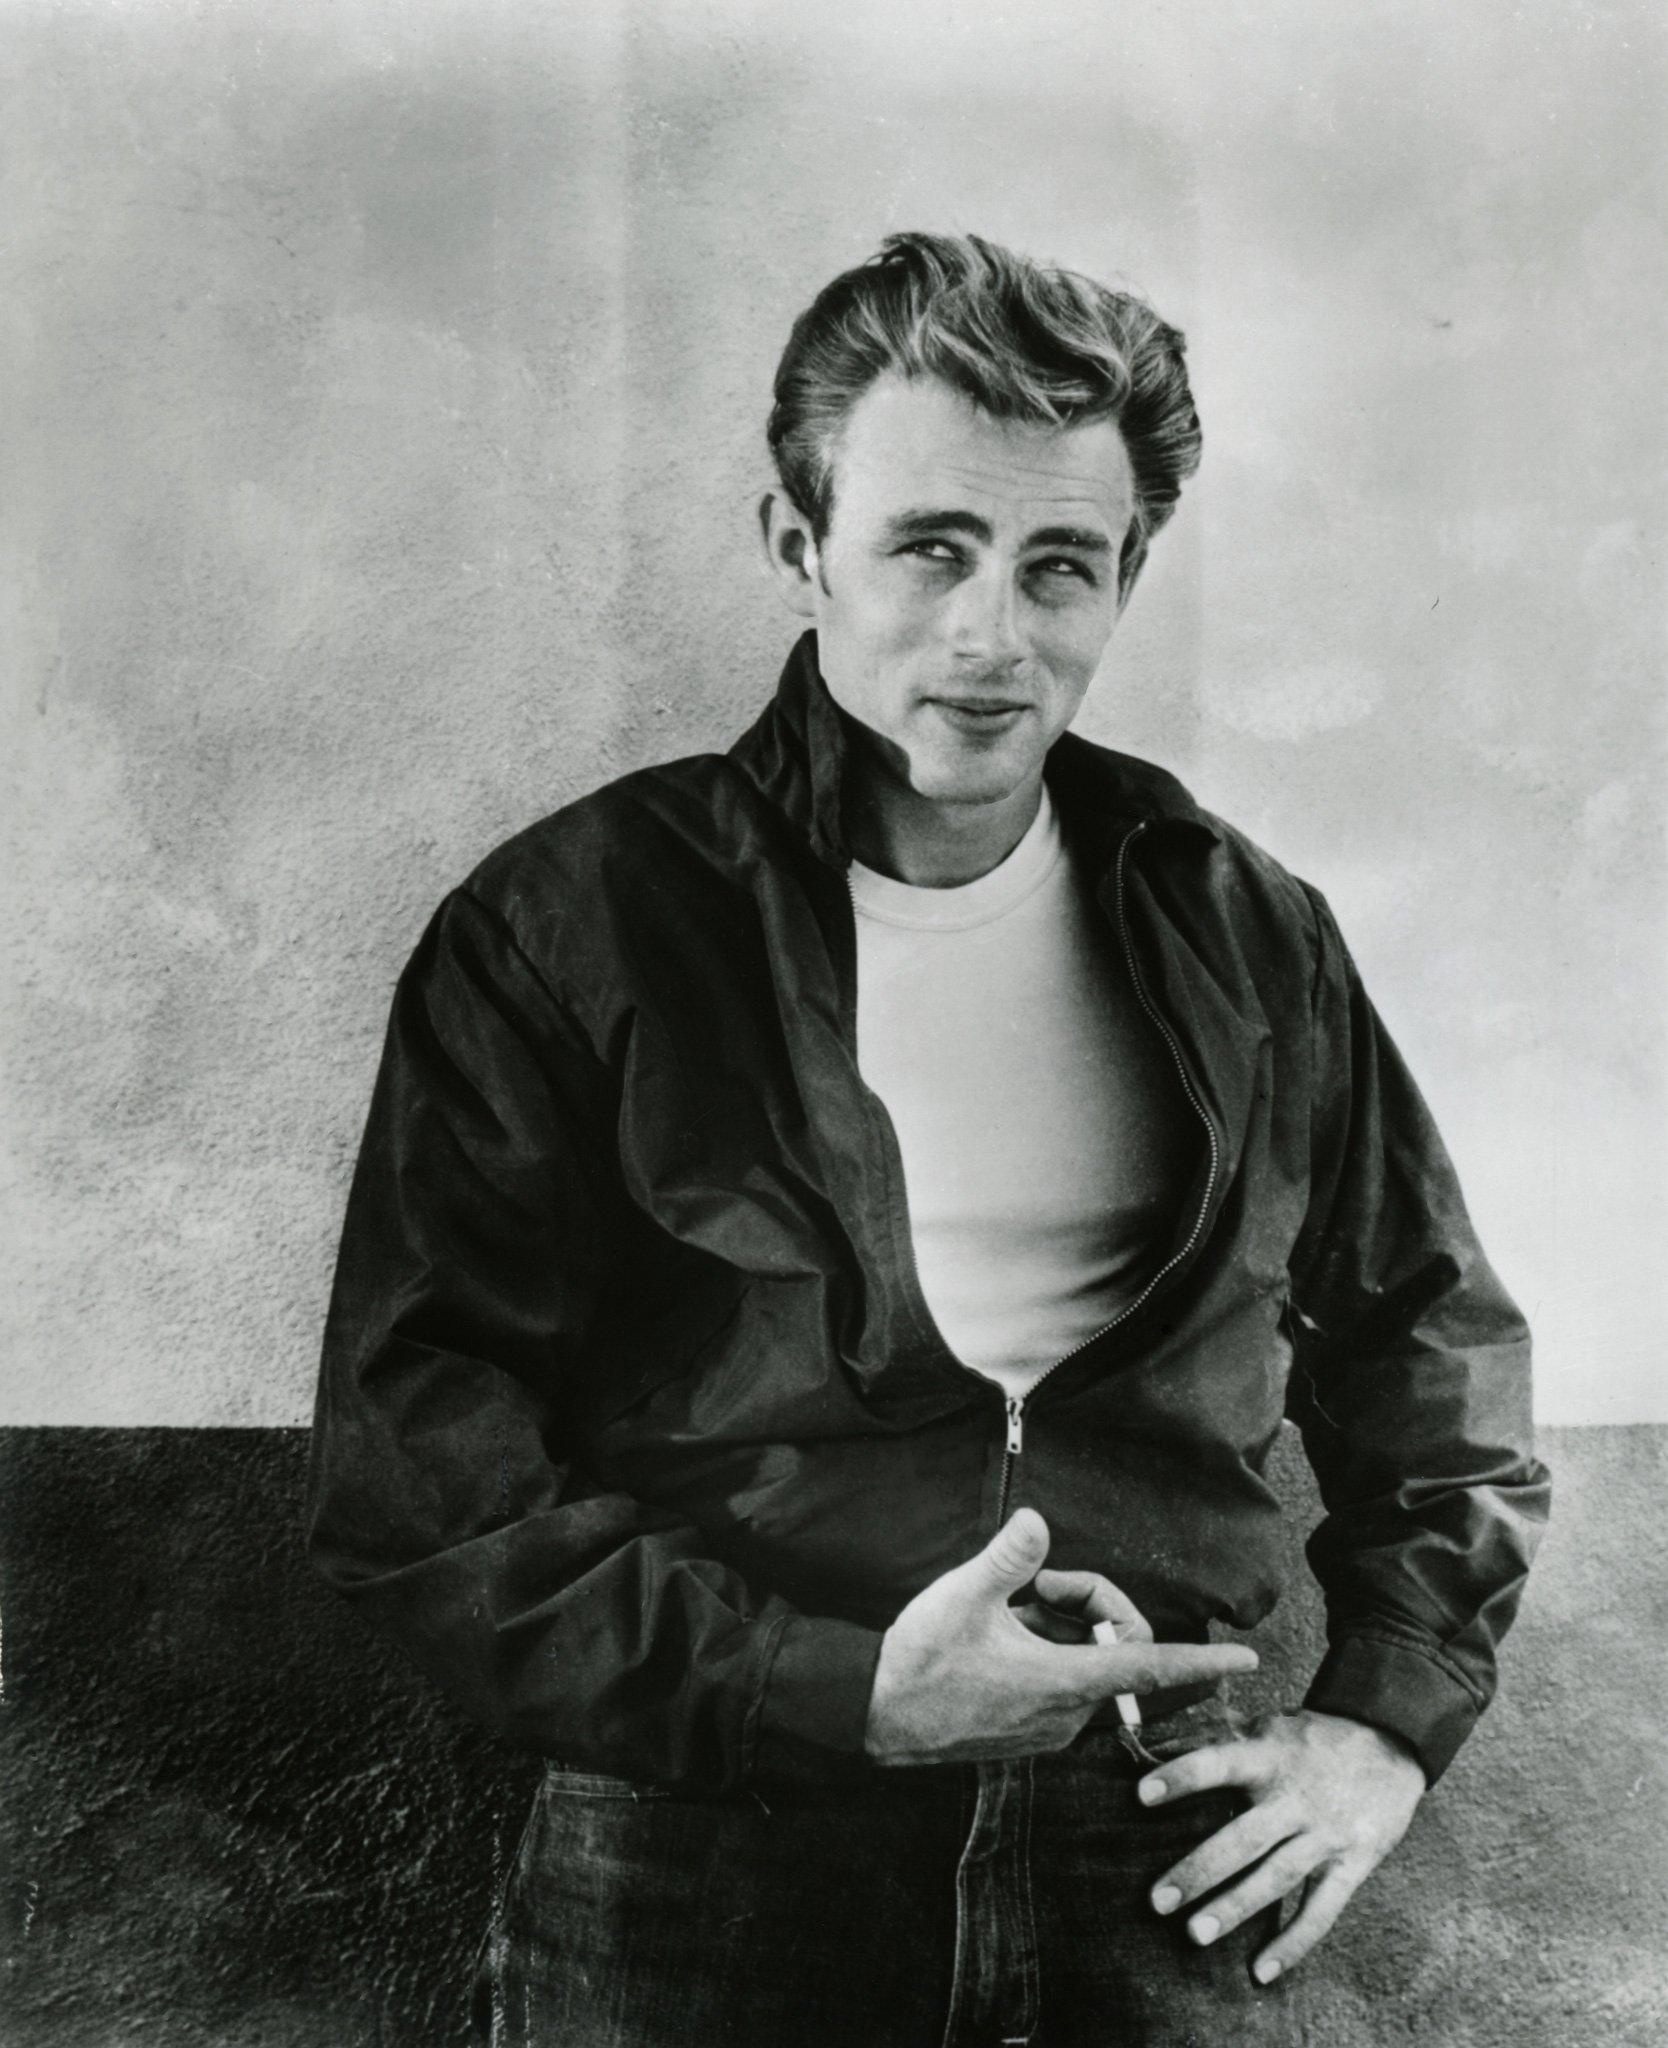 James Dean in the Harrington Jacket